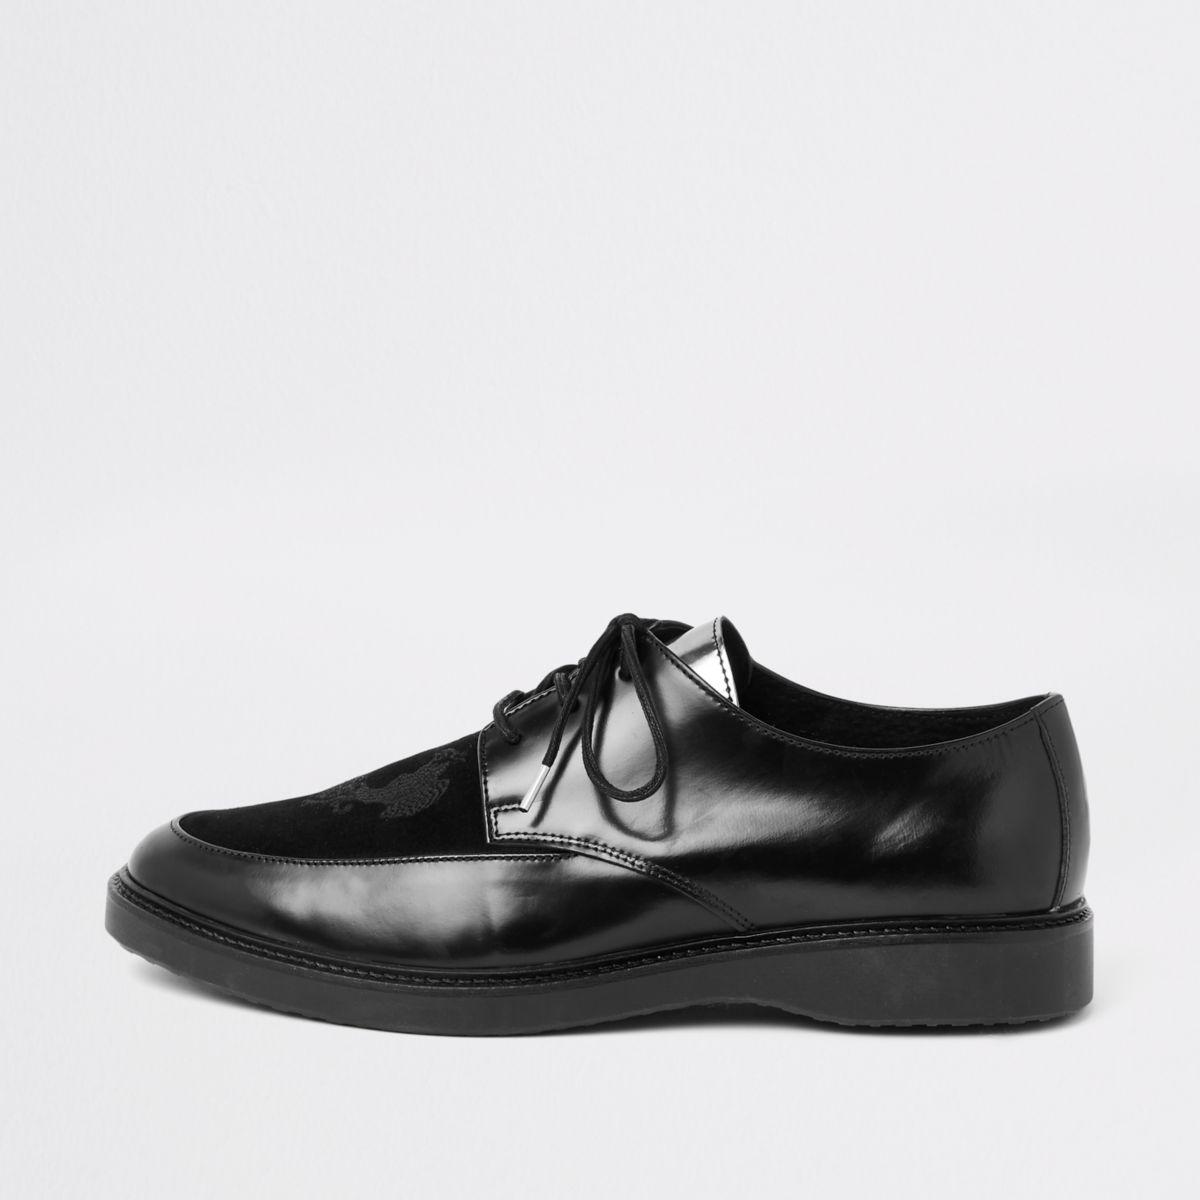 RI 30 black leather creeper shoes